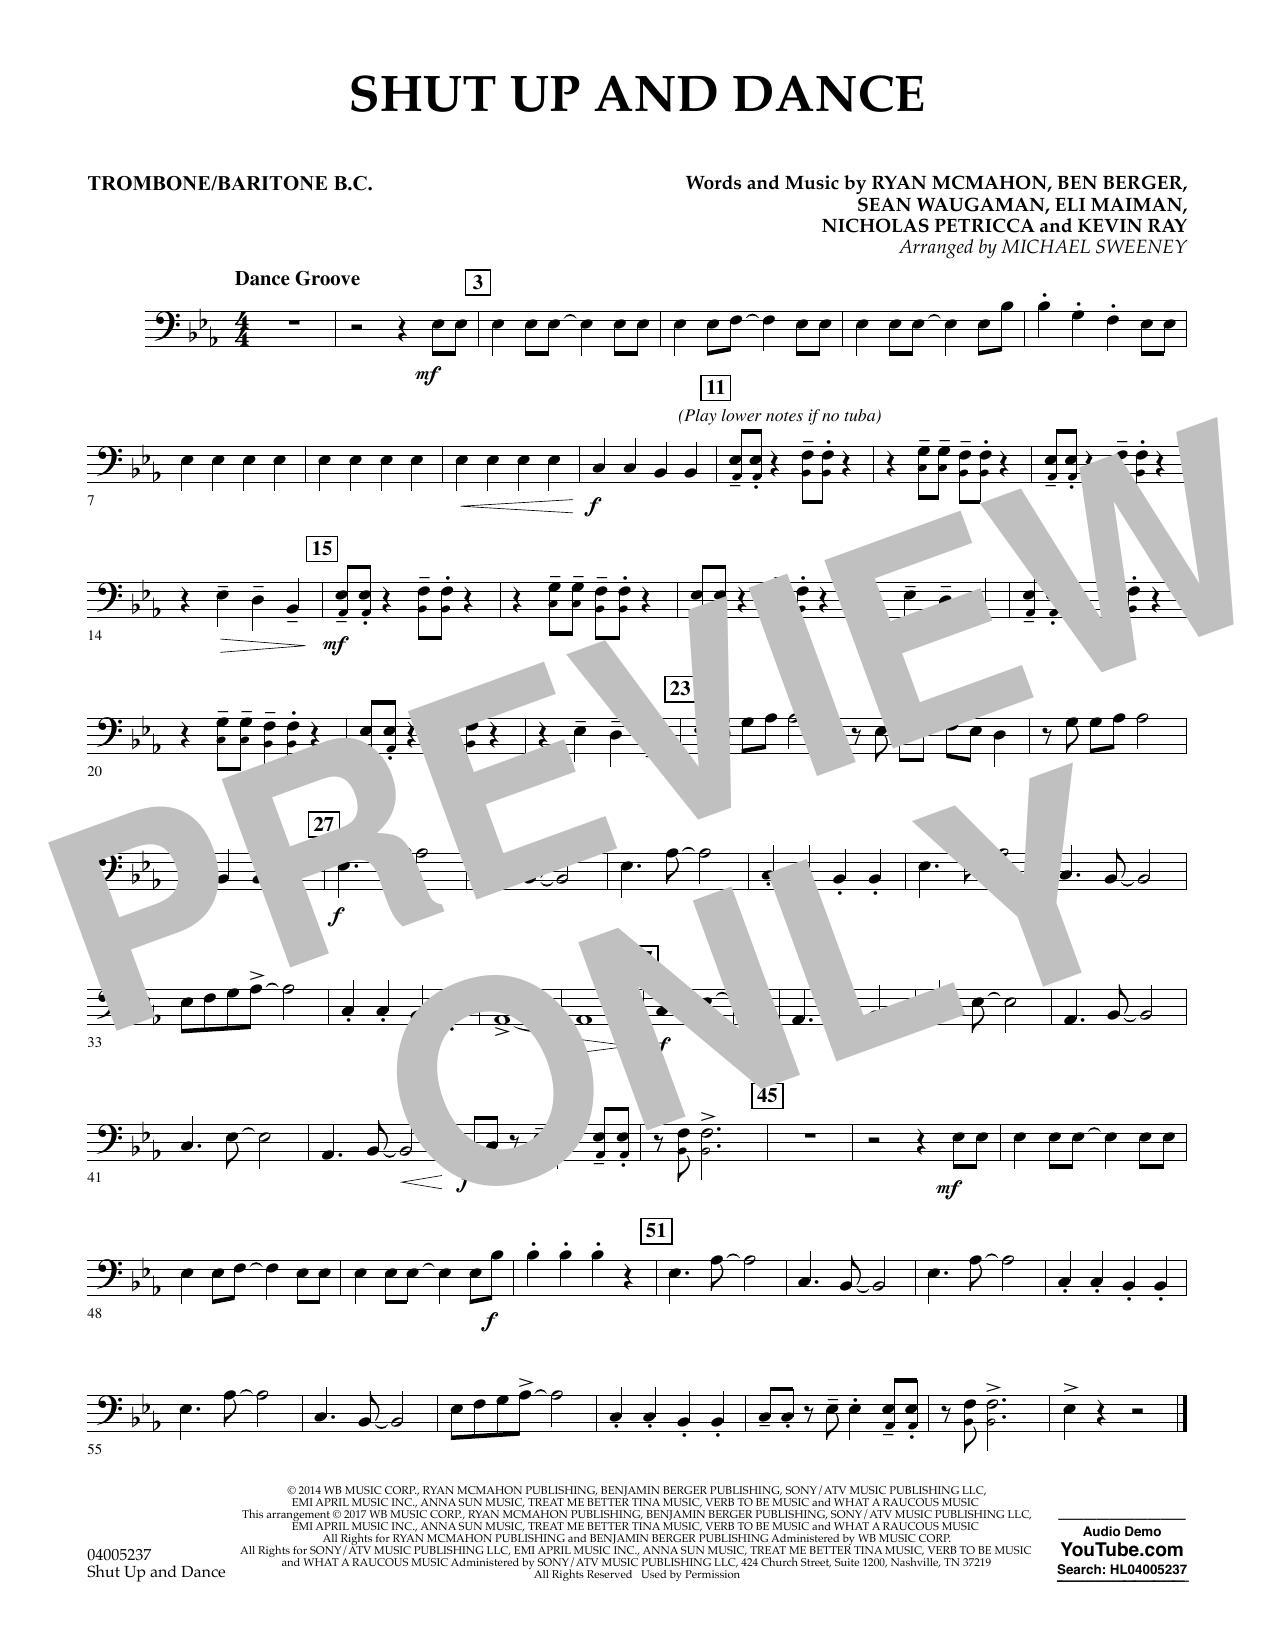 Shut Up and Dance - Trombone/Baritone B.C. (Concert Band)